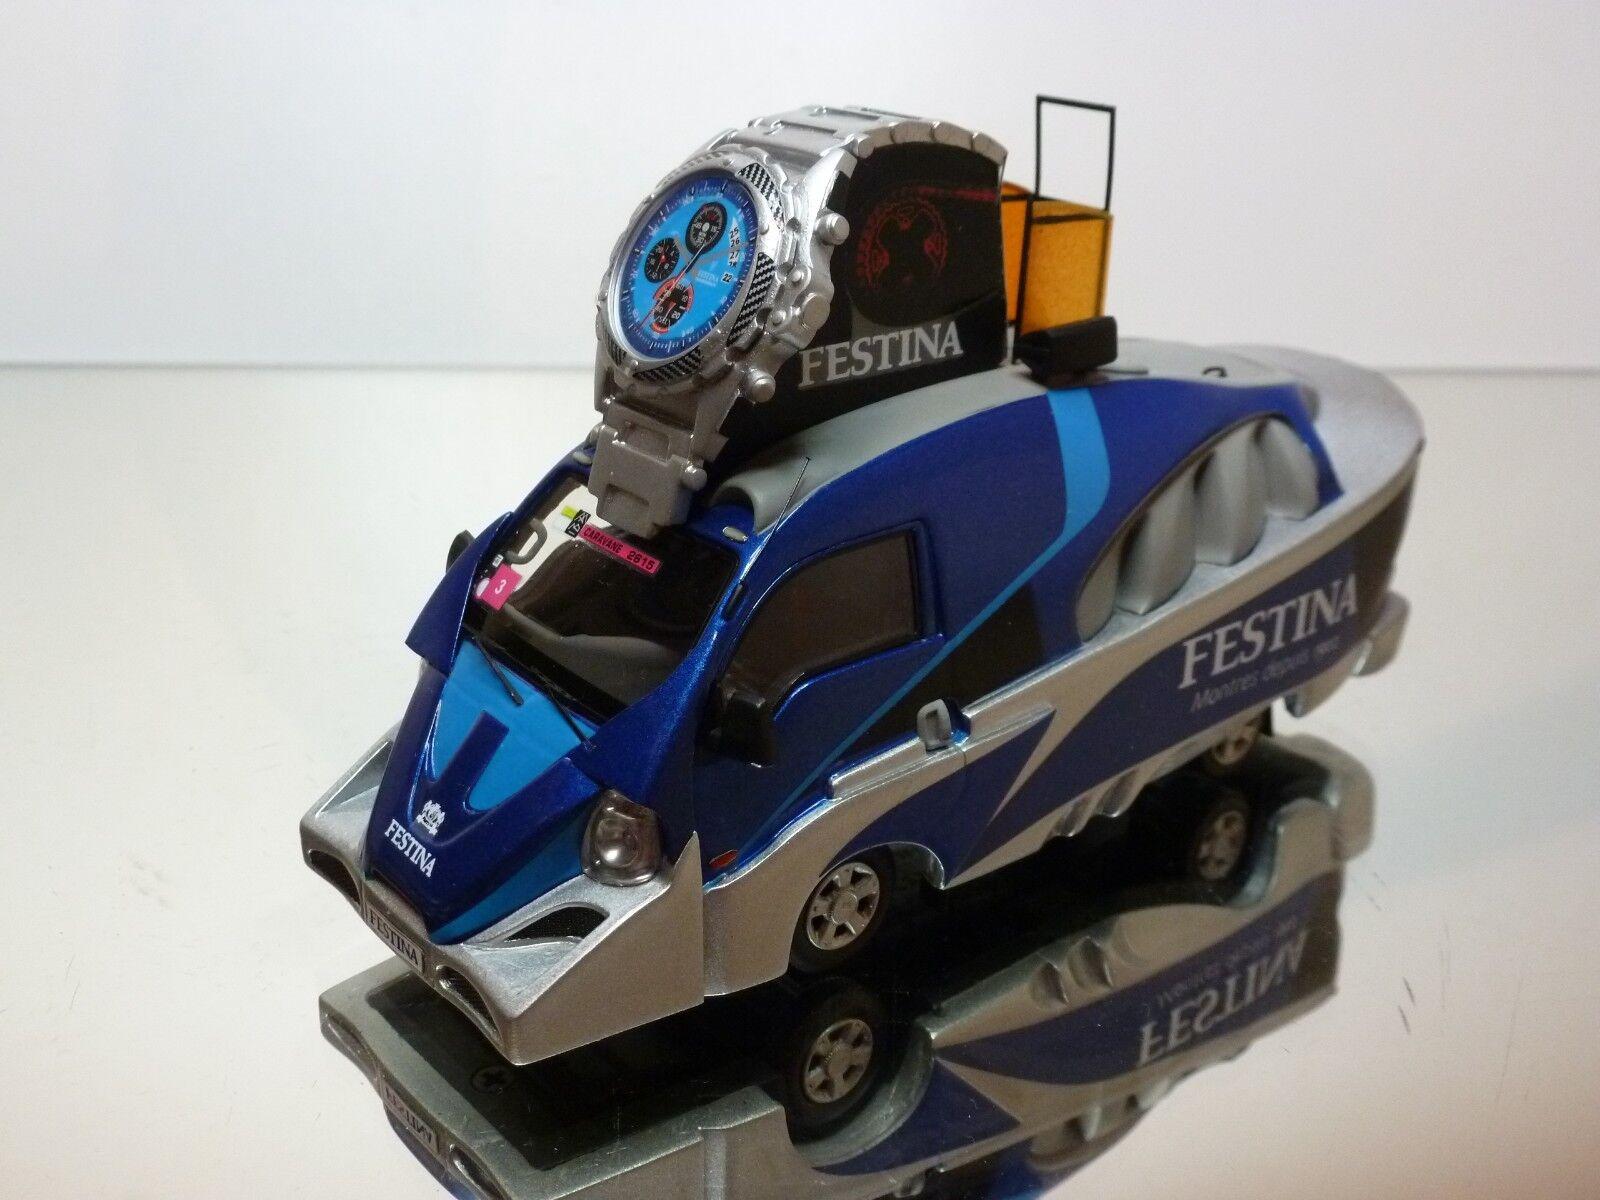 PERFEX 205 KIA FRONTIER FESTINA TOUR CYCLISTE 2012 - blueE 1 43  - EXCELLENT- 39